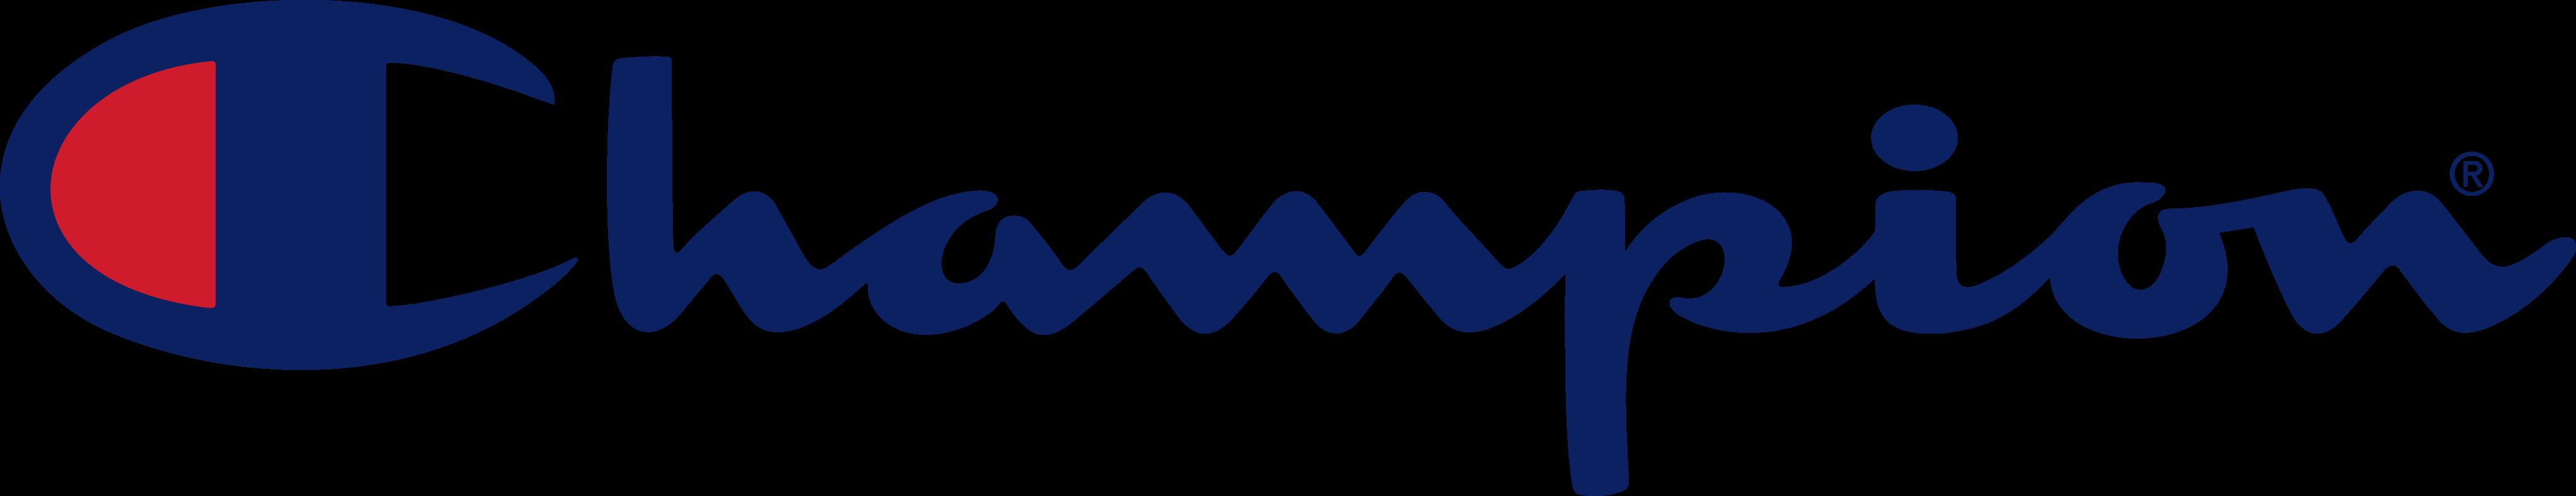 Champion Logo.